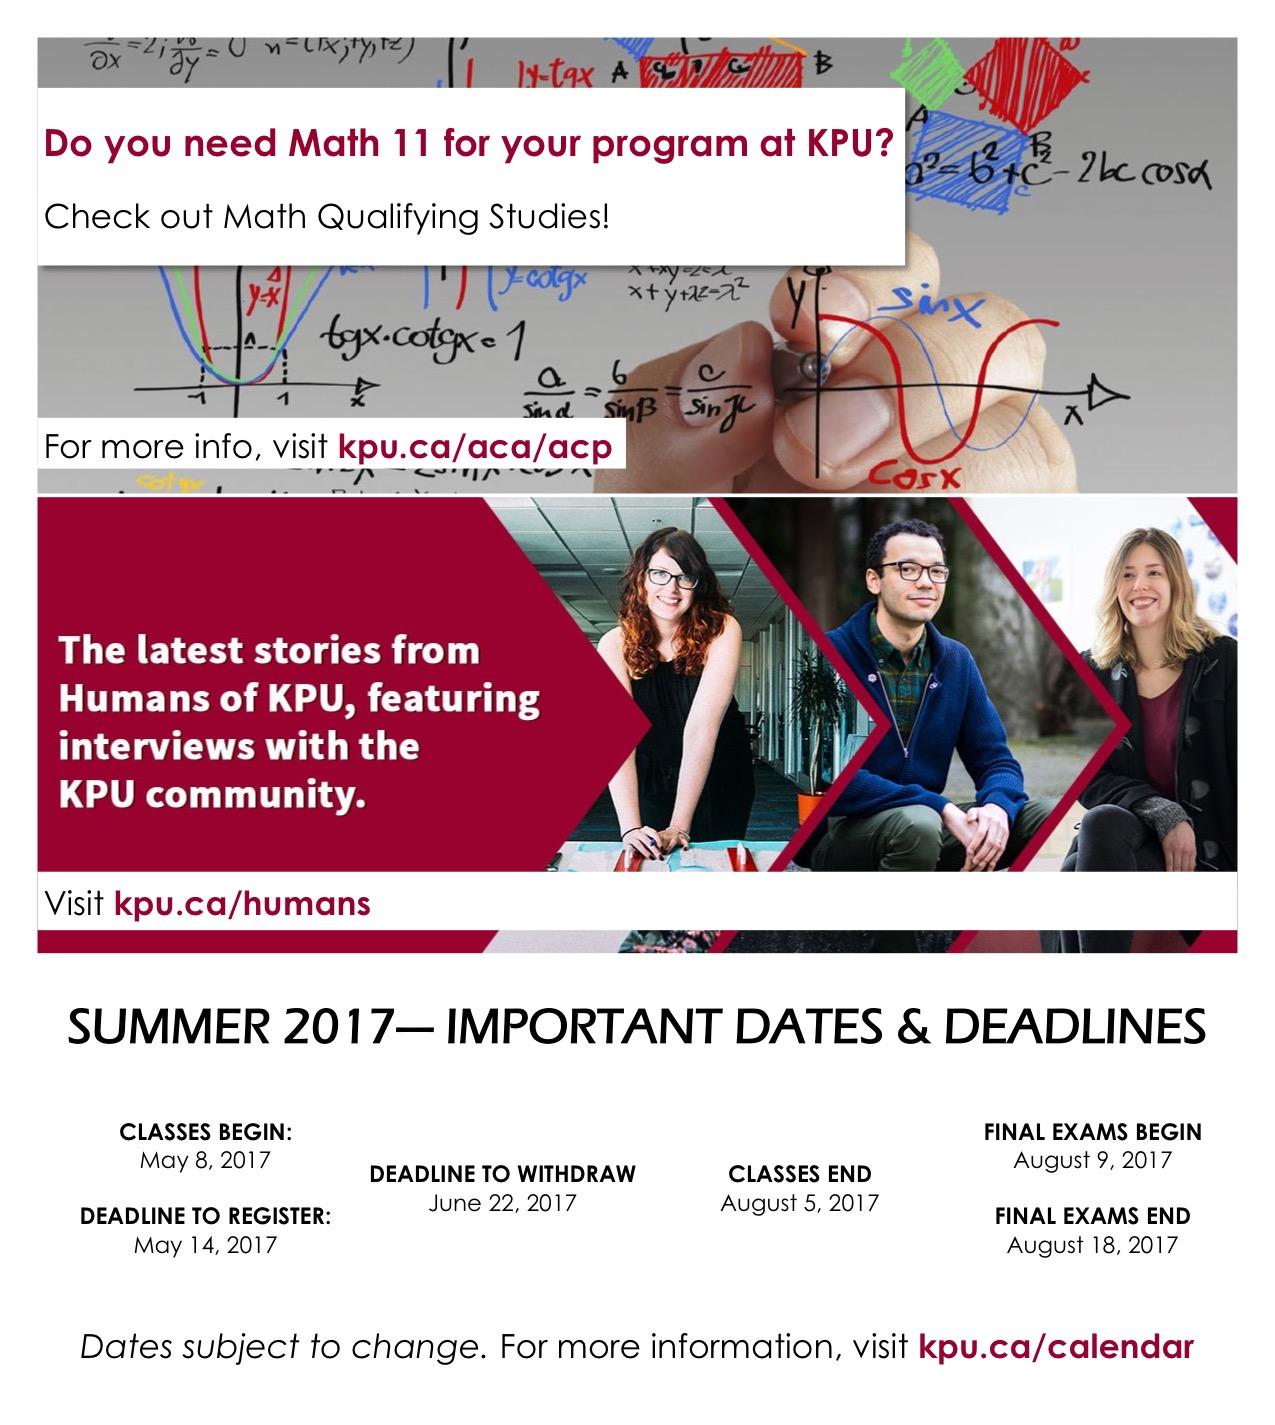 Summer 2017 Dates & Deadlines